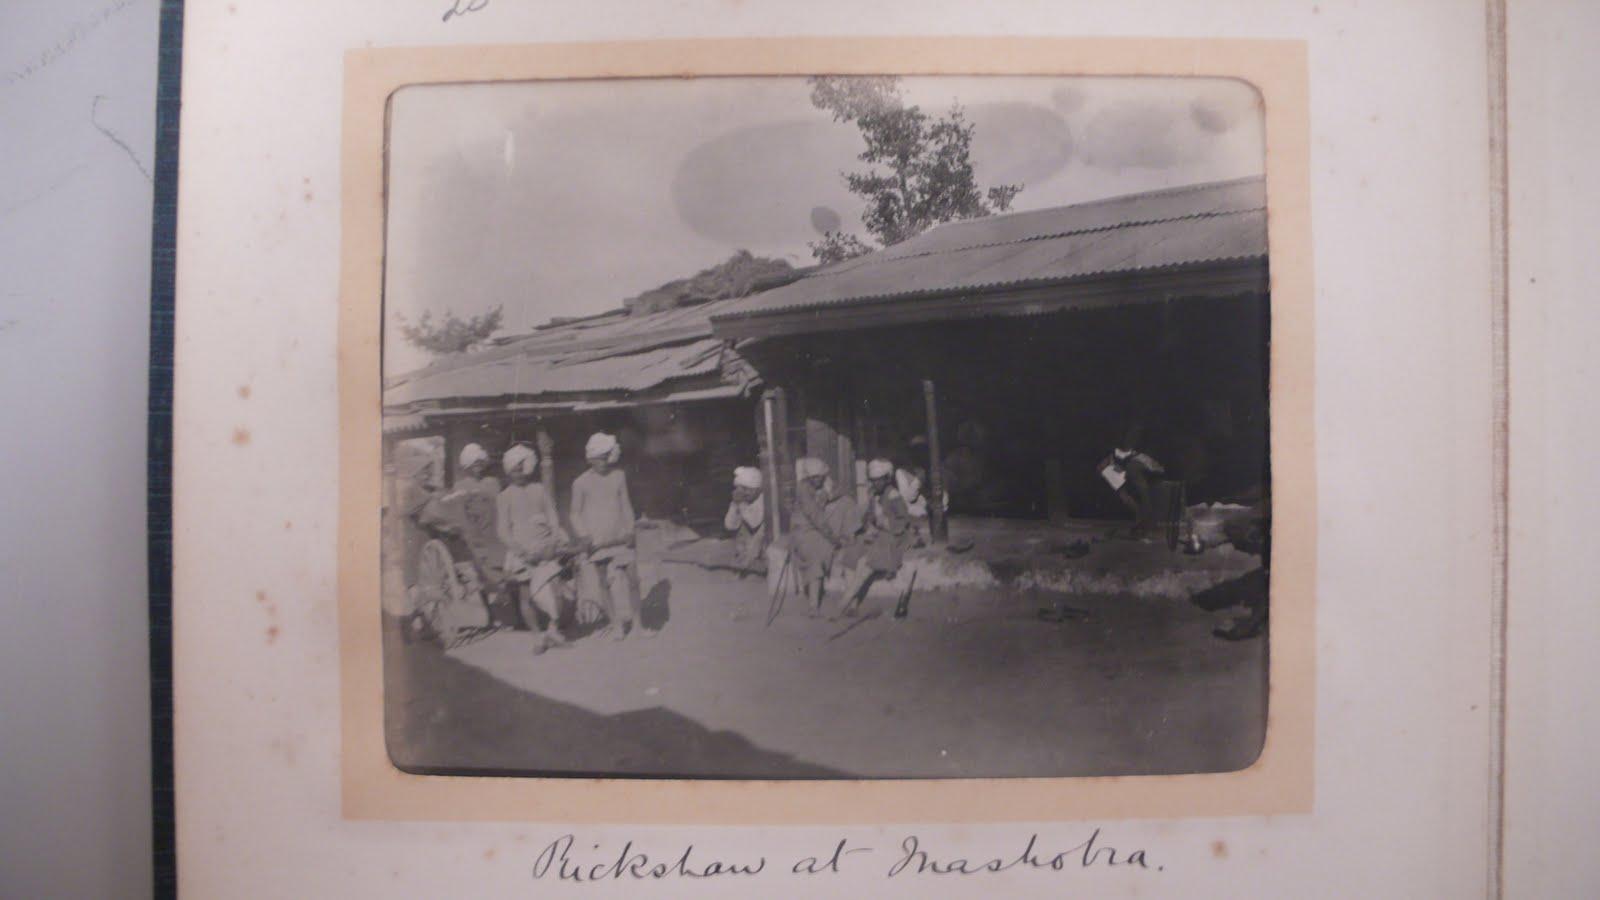 Mashobra India Rickshaw - 1902